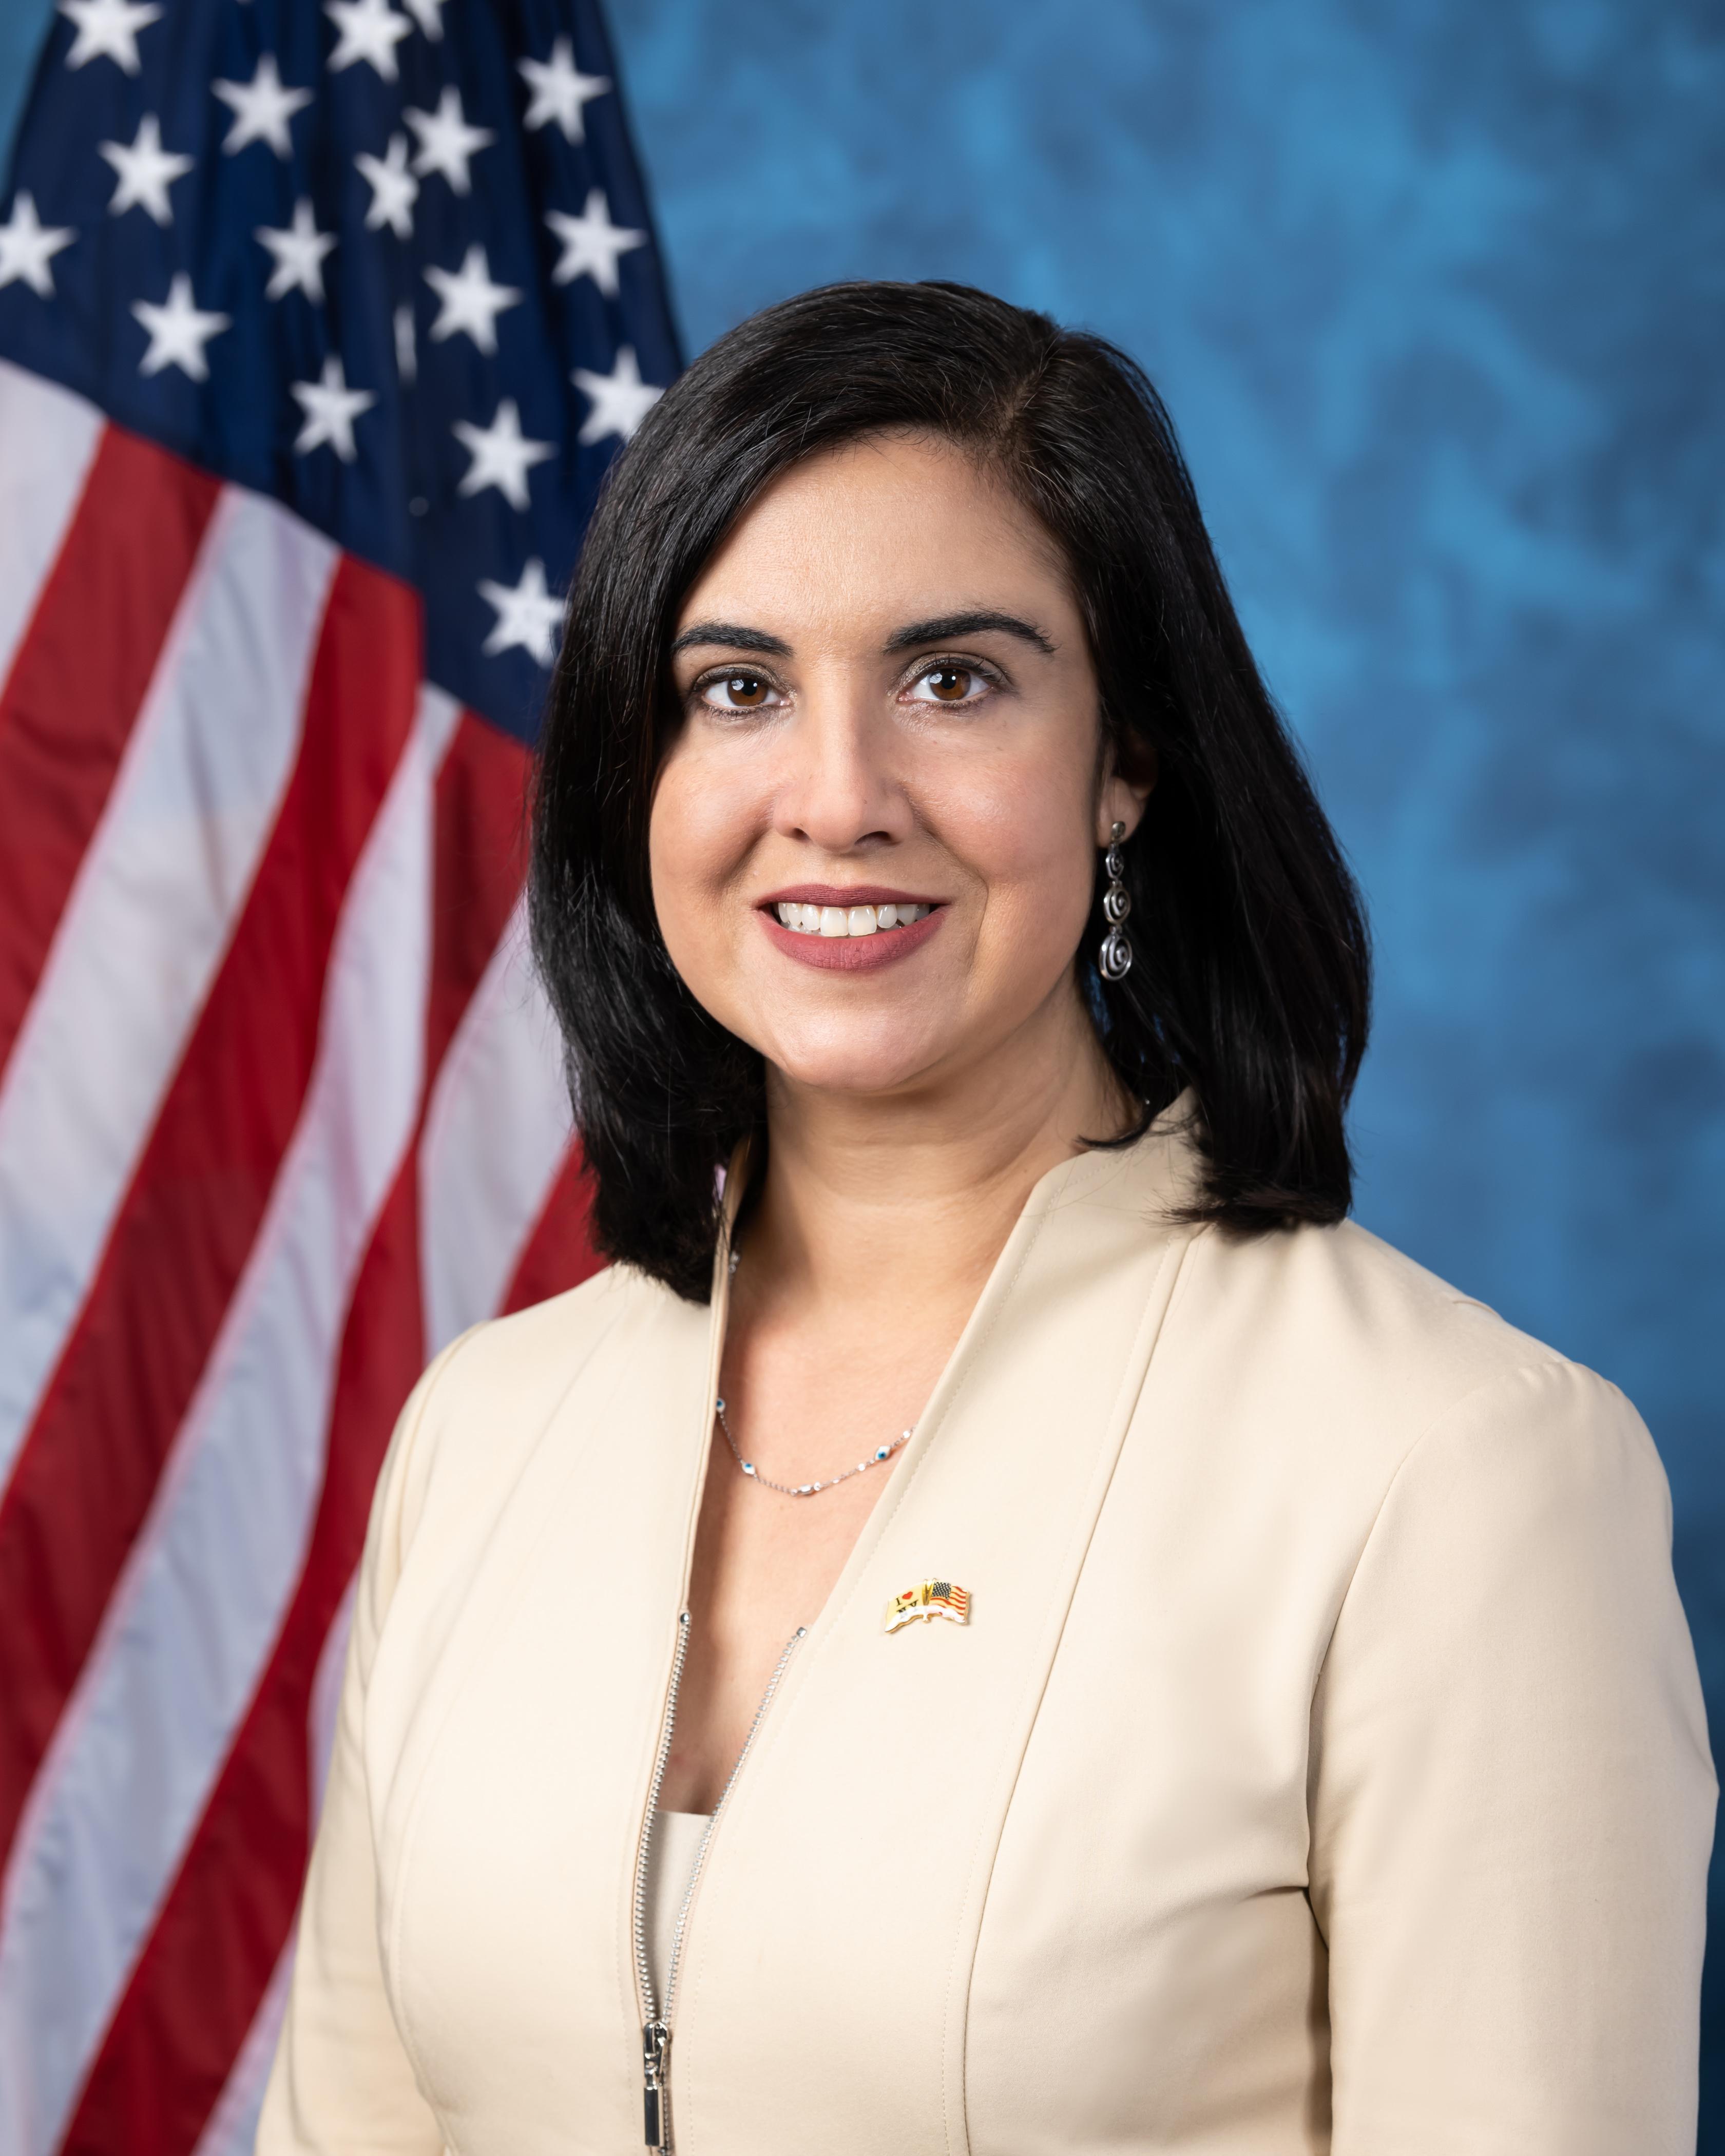 Representative Nicole Malliotakis New York's 11th Congressional District